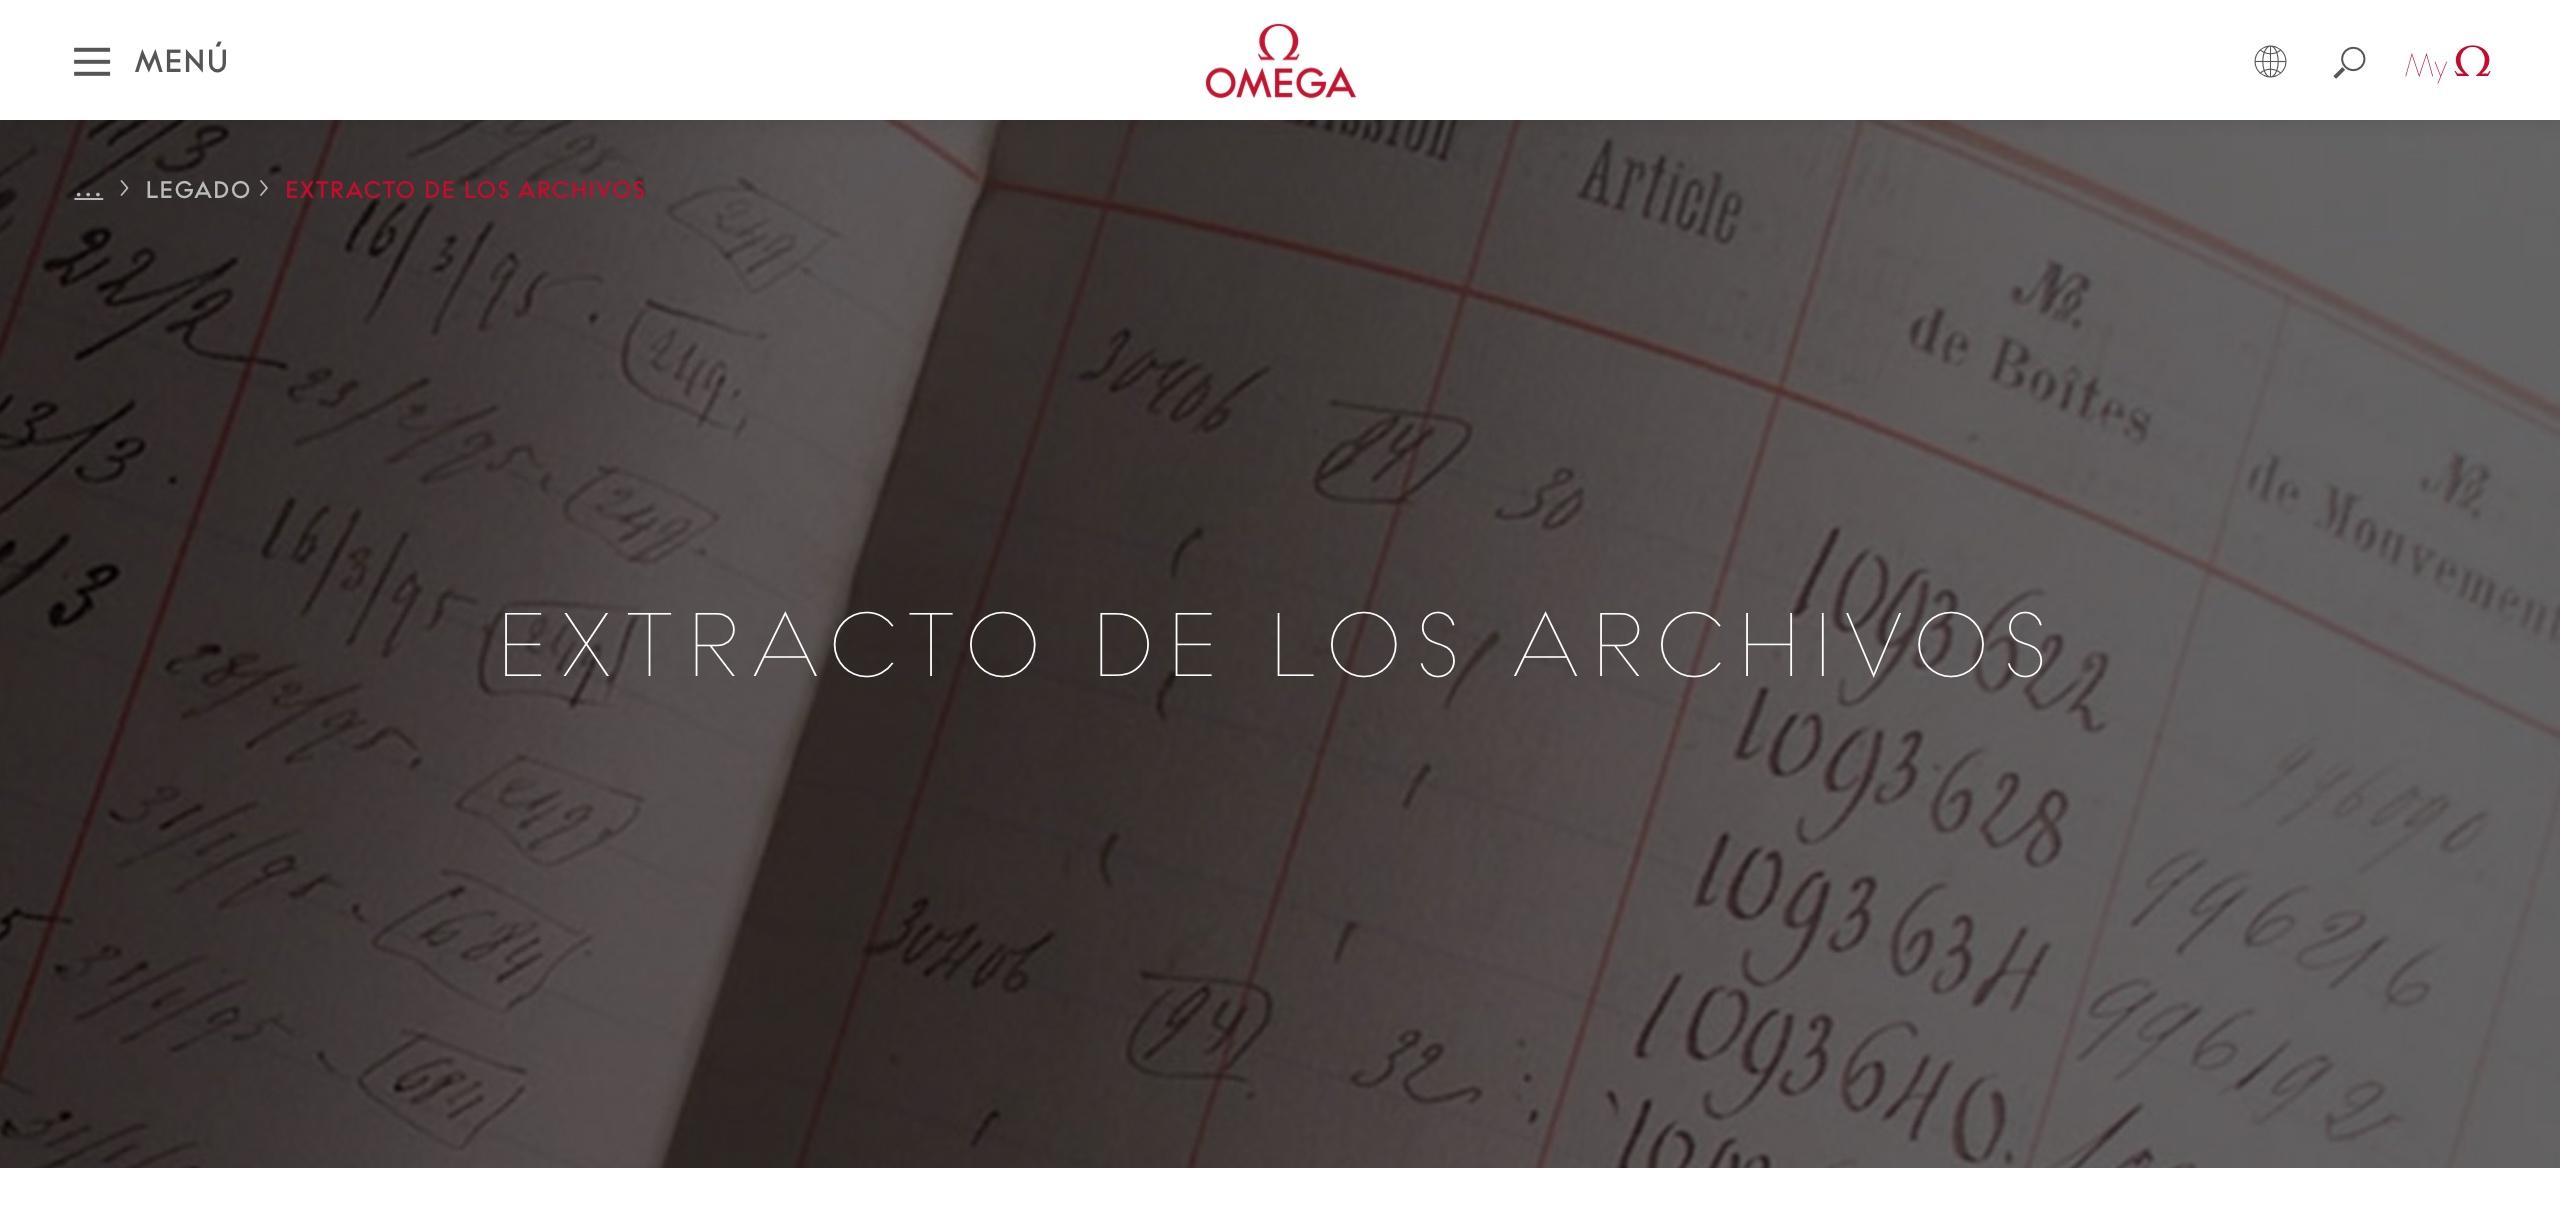 Omega Extracto Archivos Header